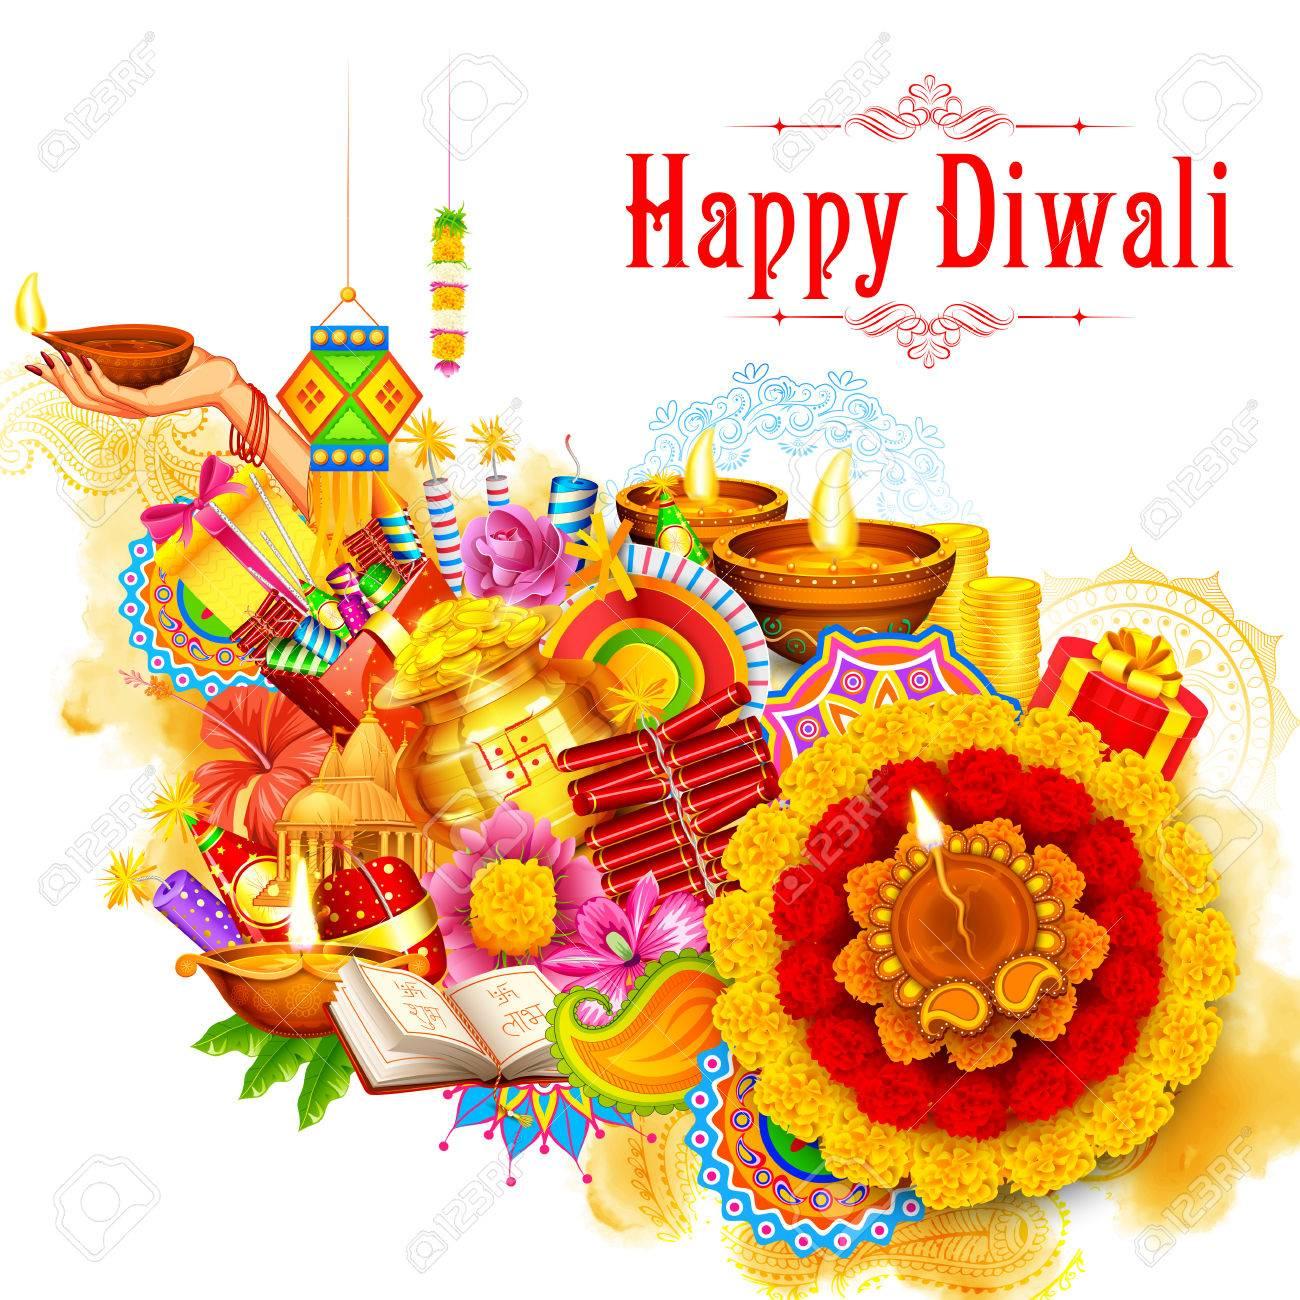 illustration of burning diya on Happy Diwali Holiday background for light festival of India - 67482107